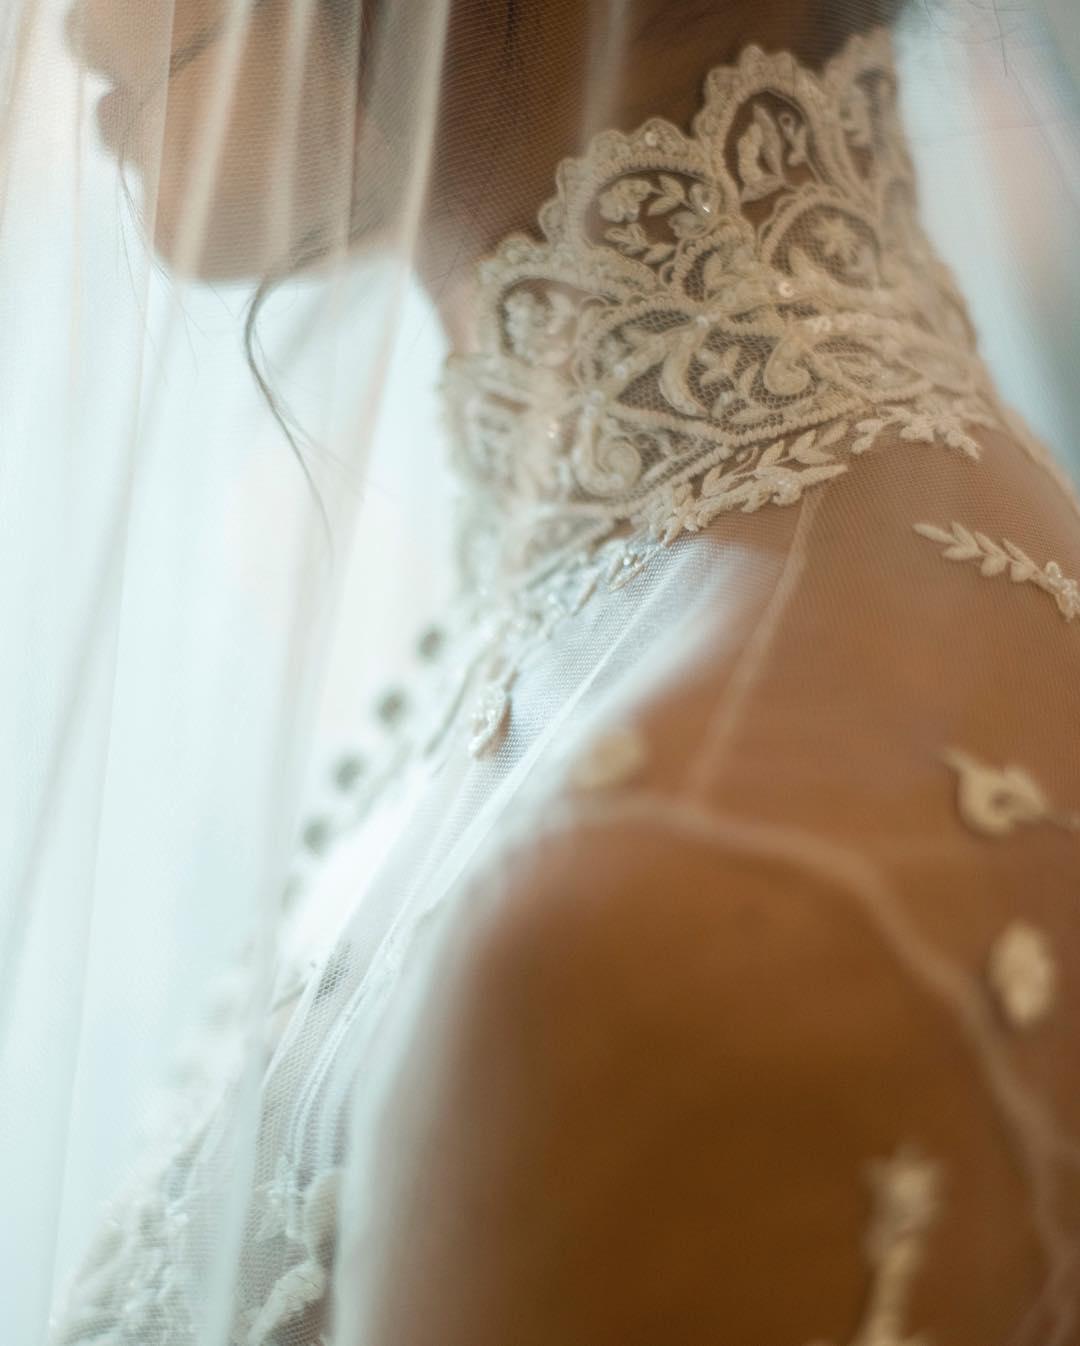 priyanka chopra jonas bride vogue issue